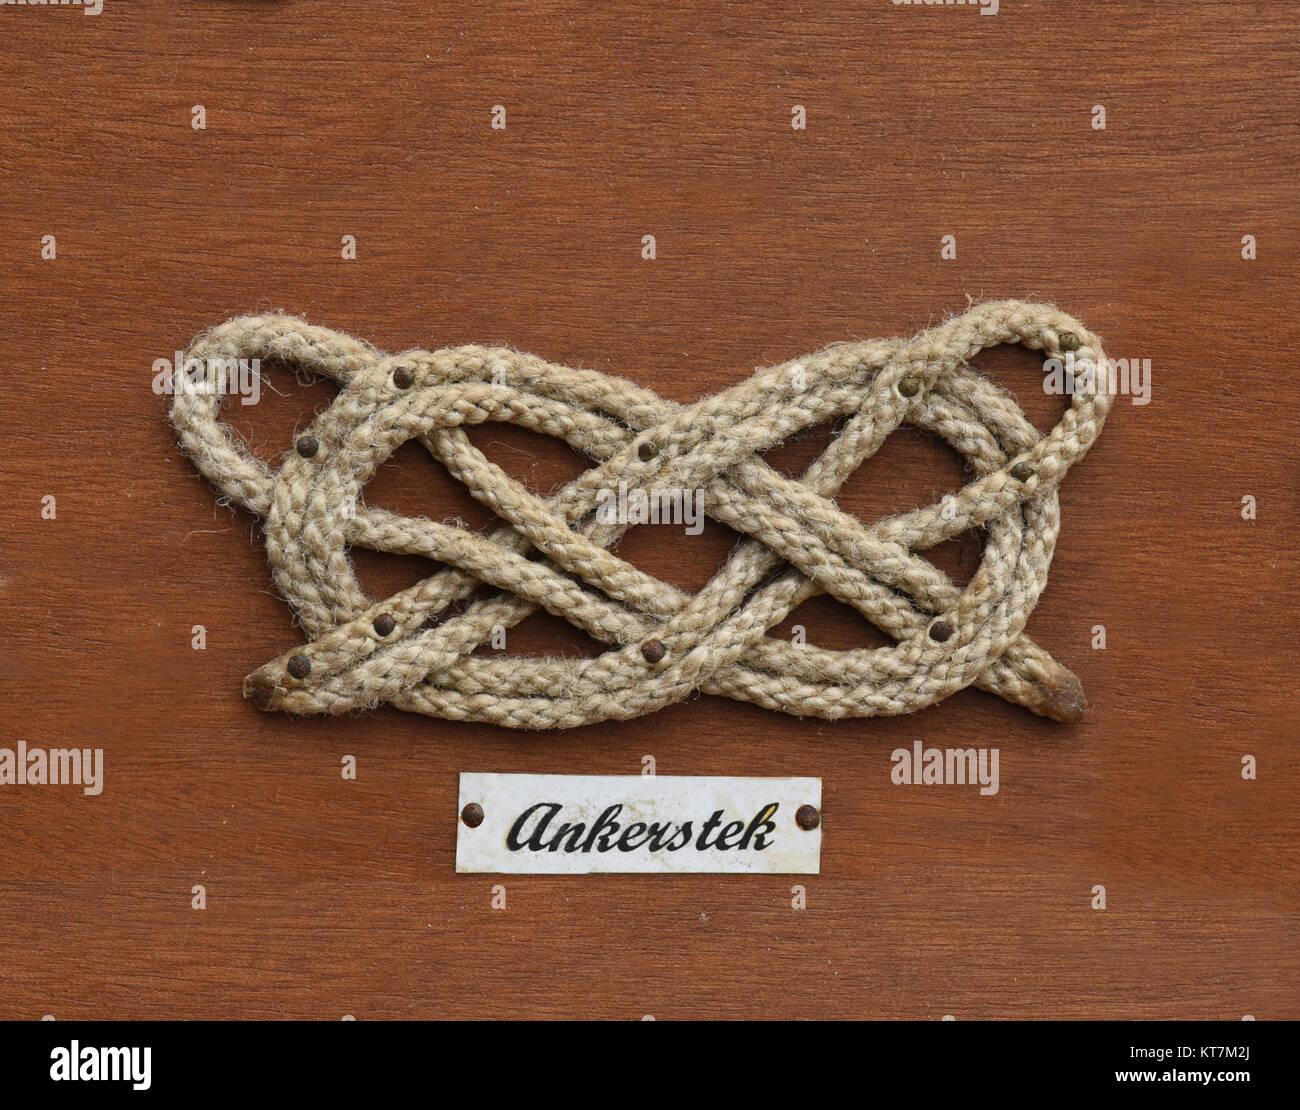 Ankerstek, Seemannsknoten - Stock Image